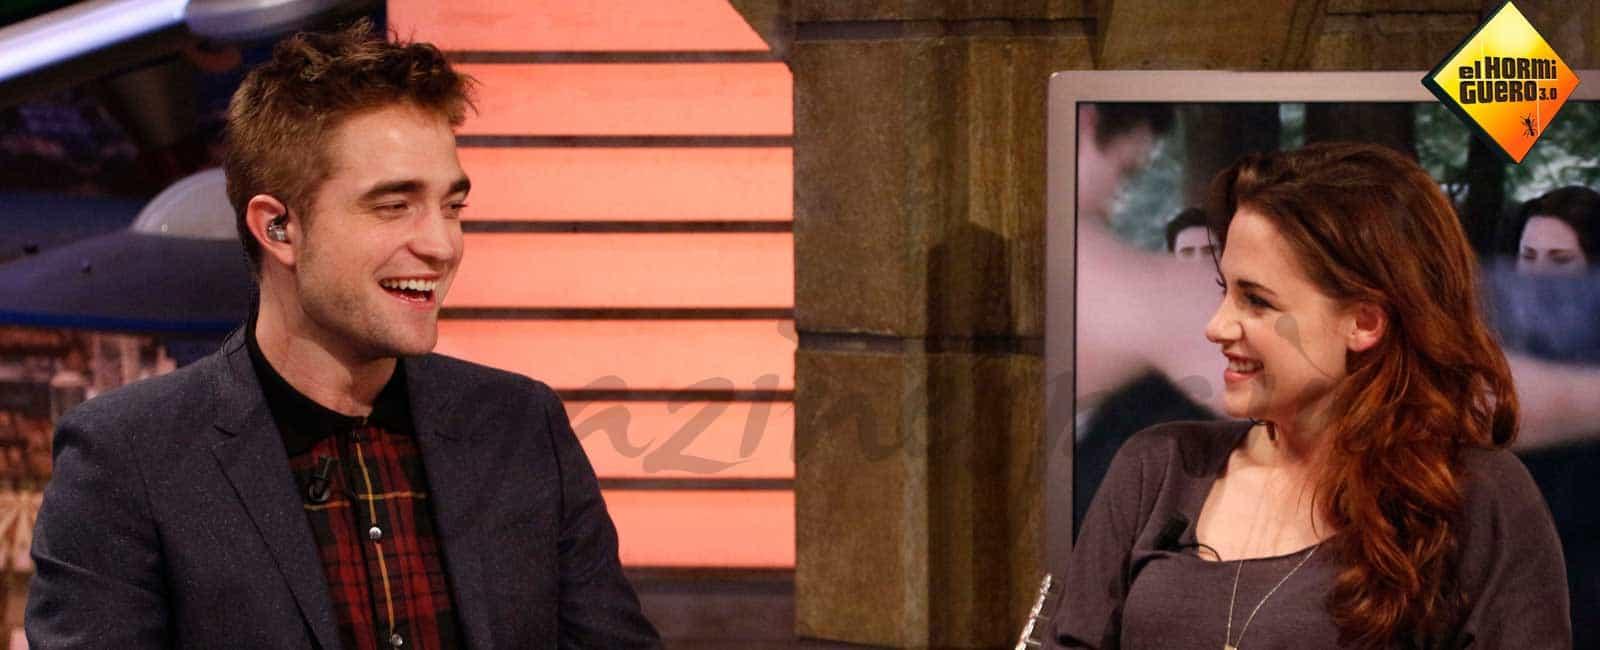 Kristen Stewart y Robert Pattinson… ¿Amor o montaje?